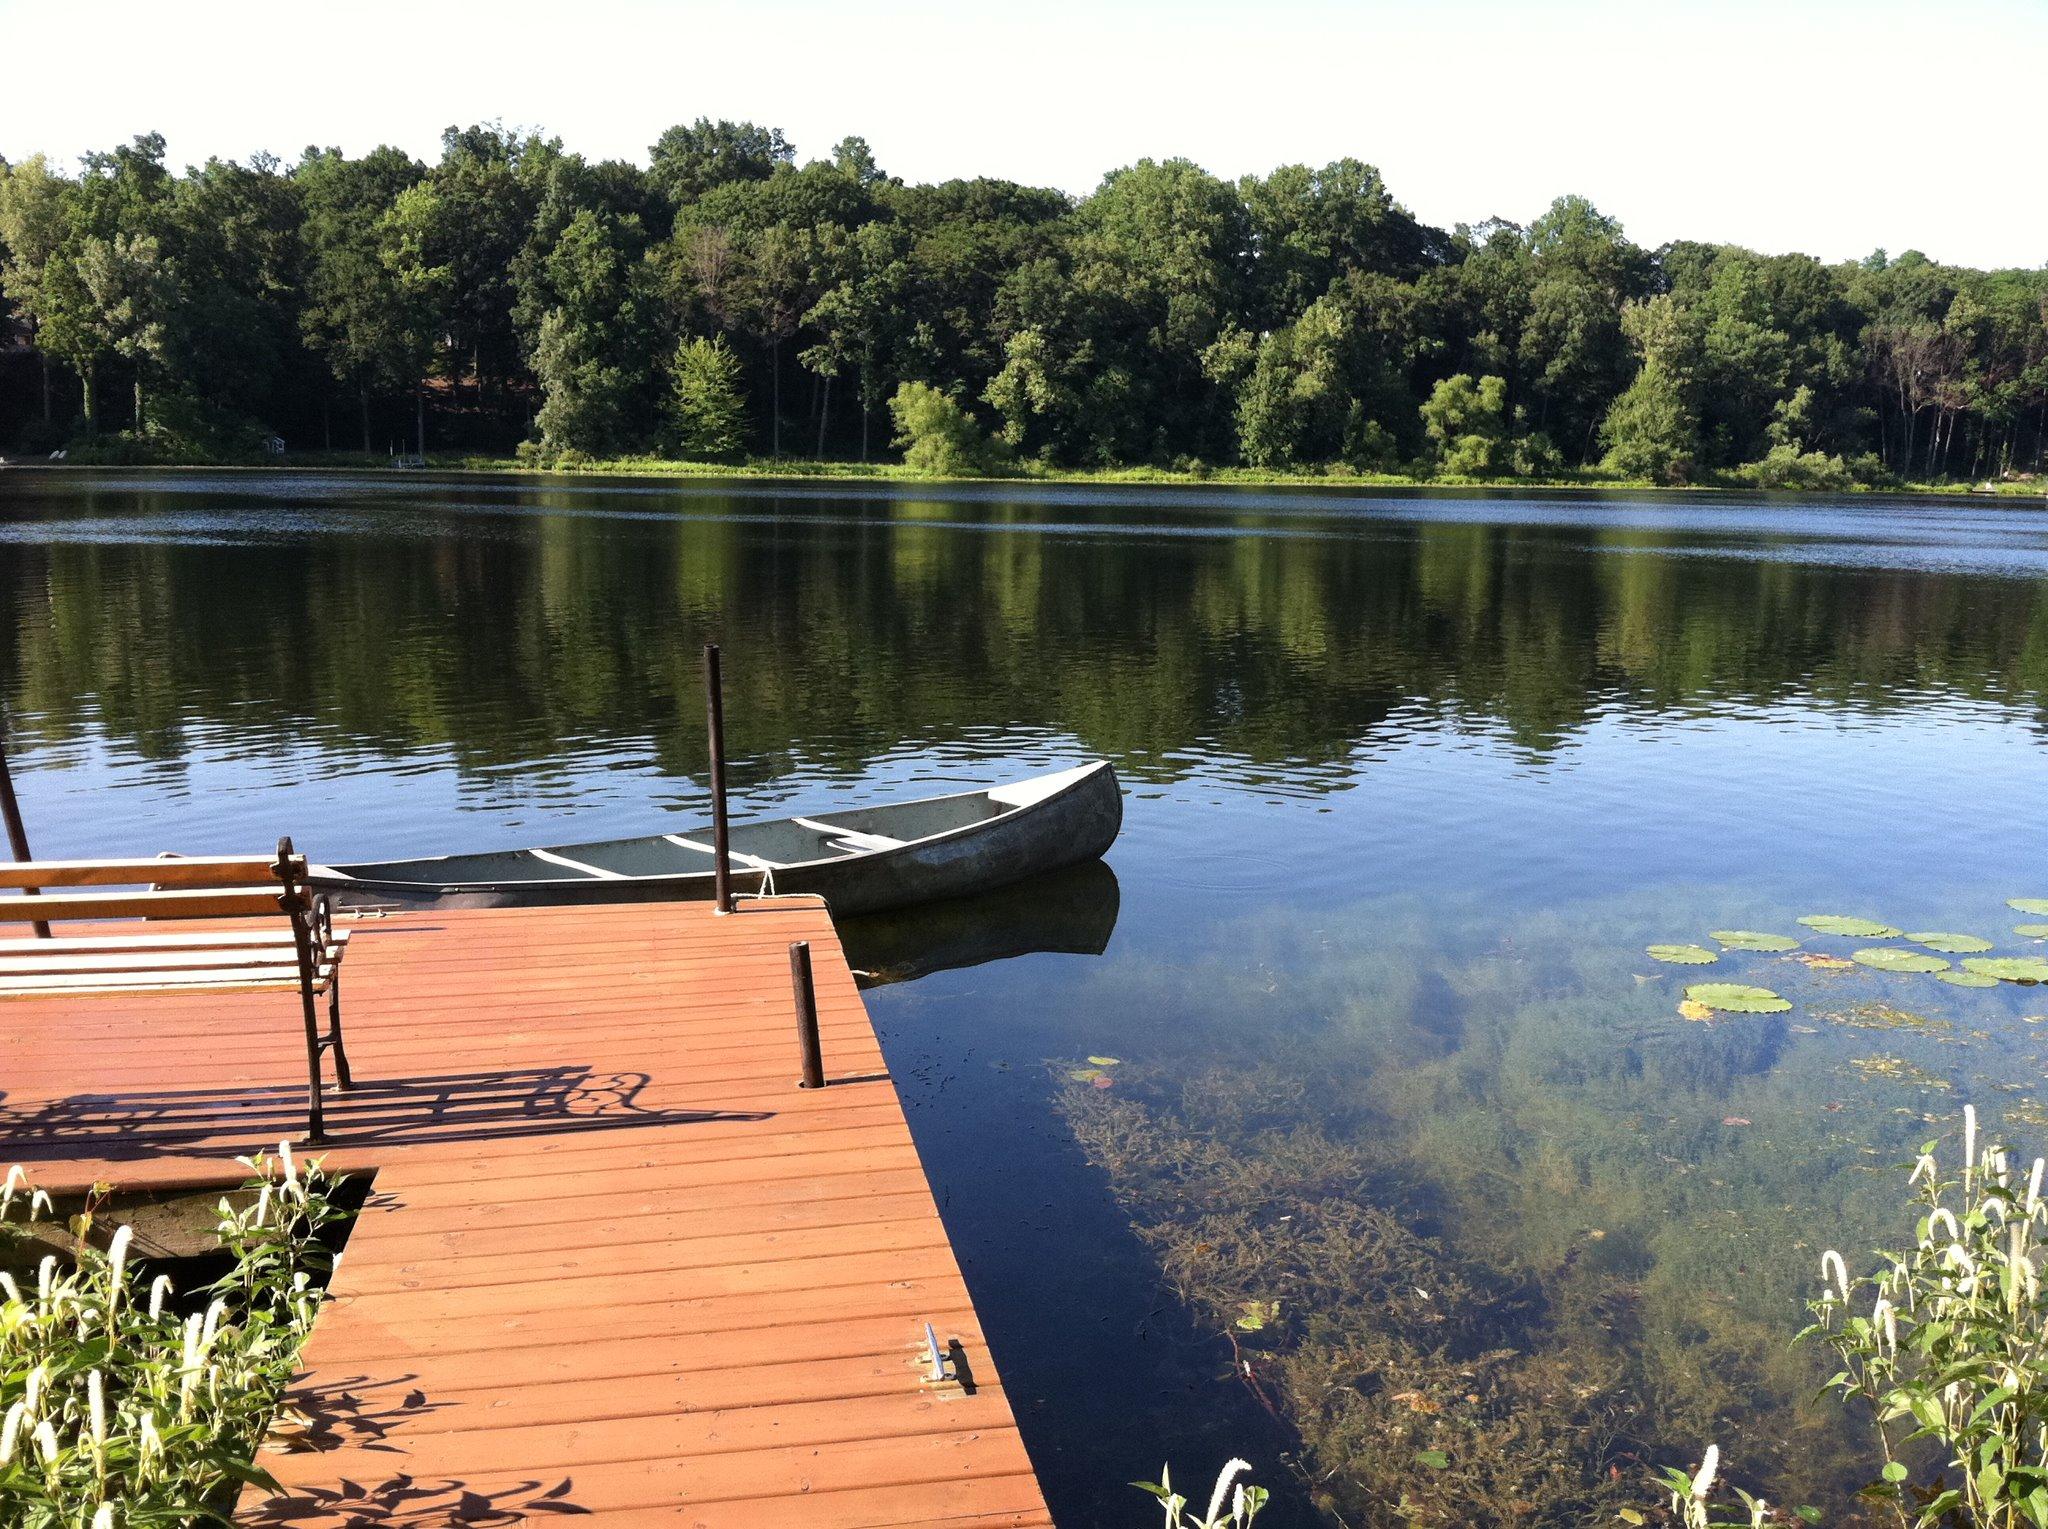 Dock,LakeandCanoe